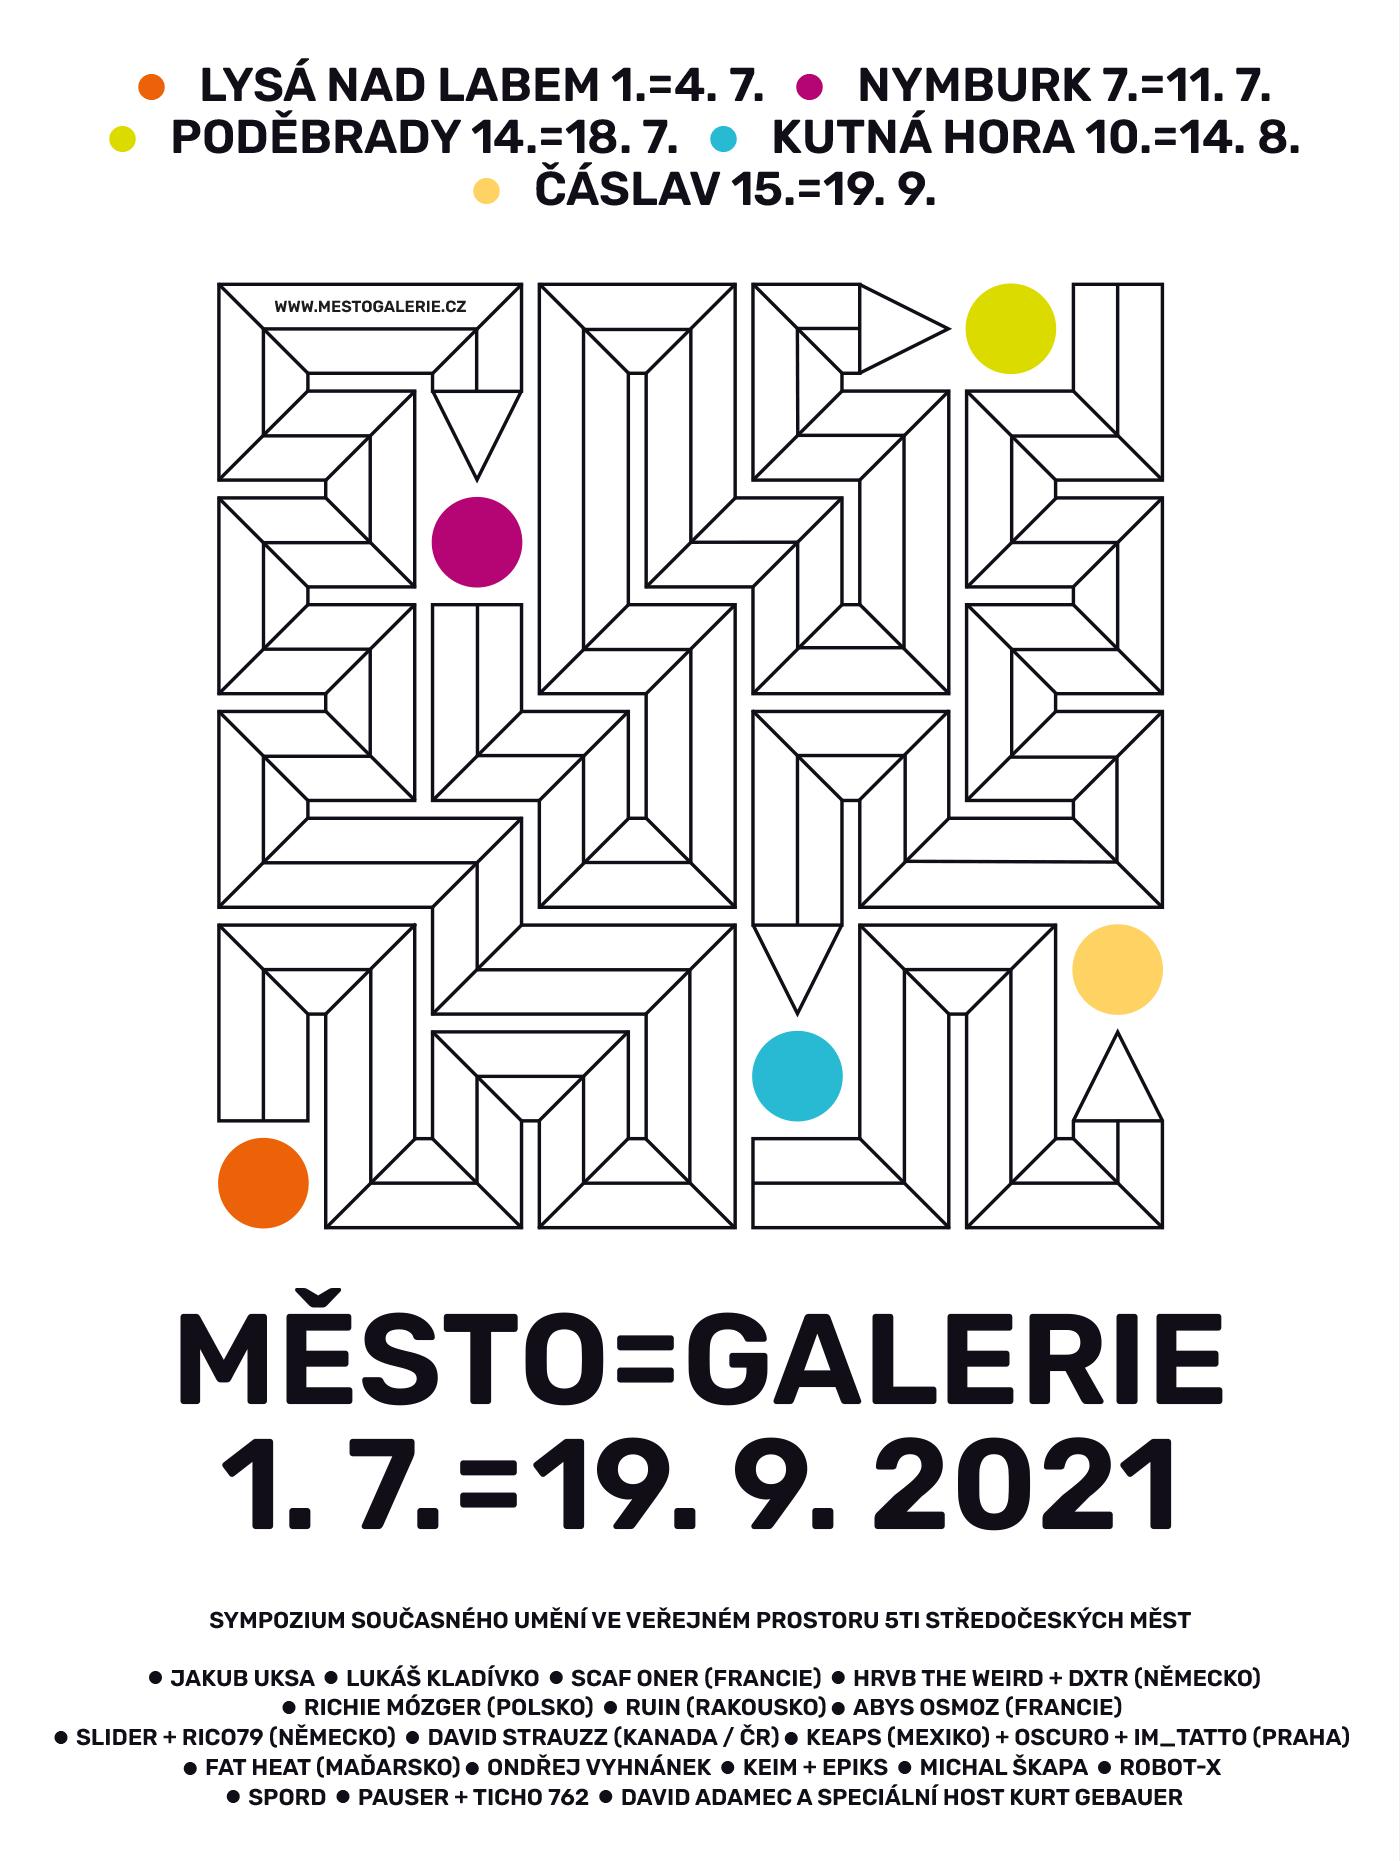 MĚSTO=GALERIE 2021